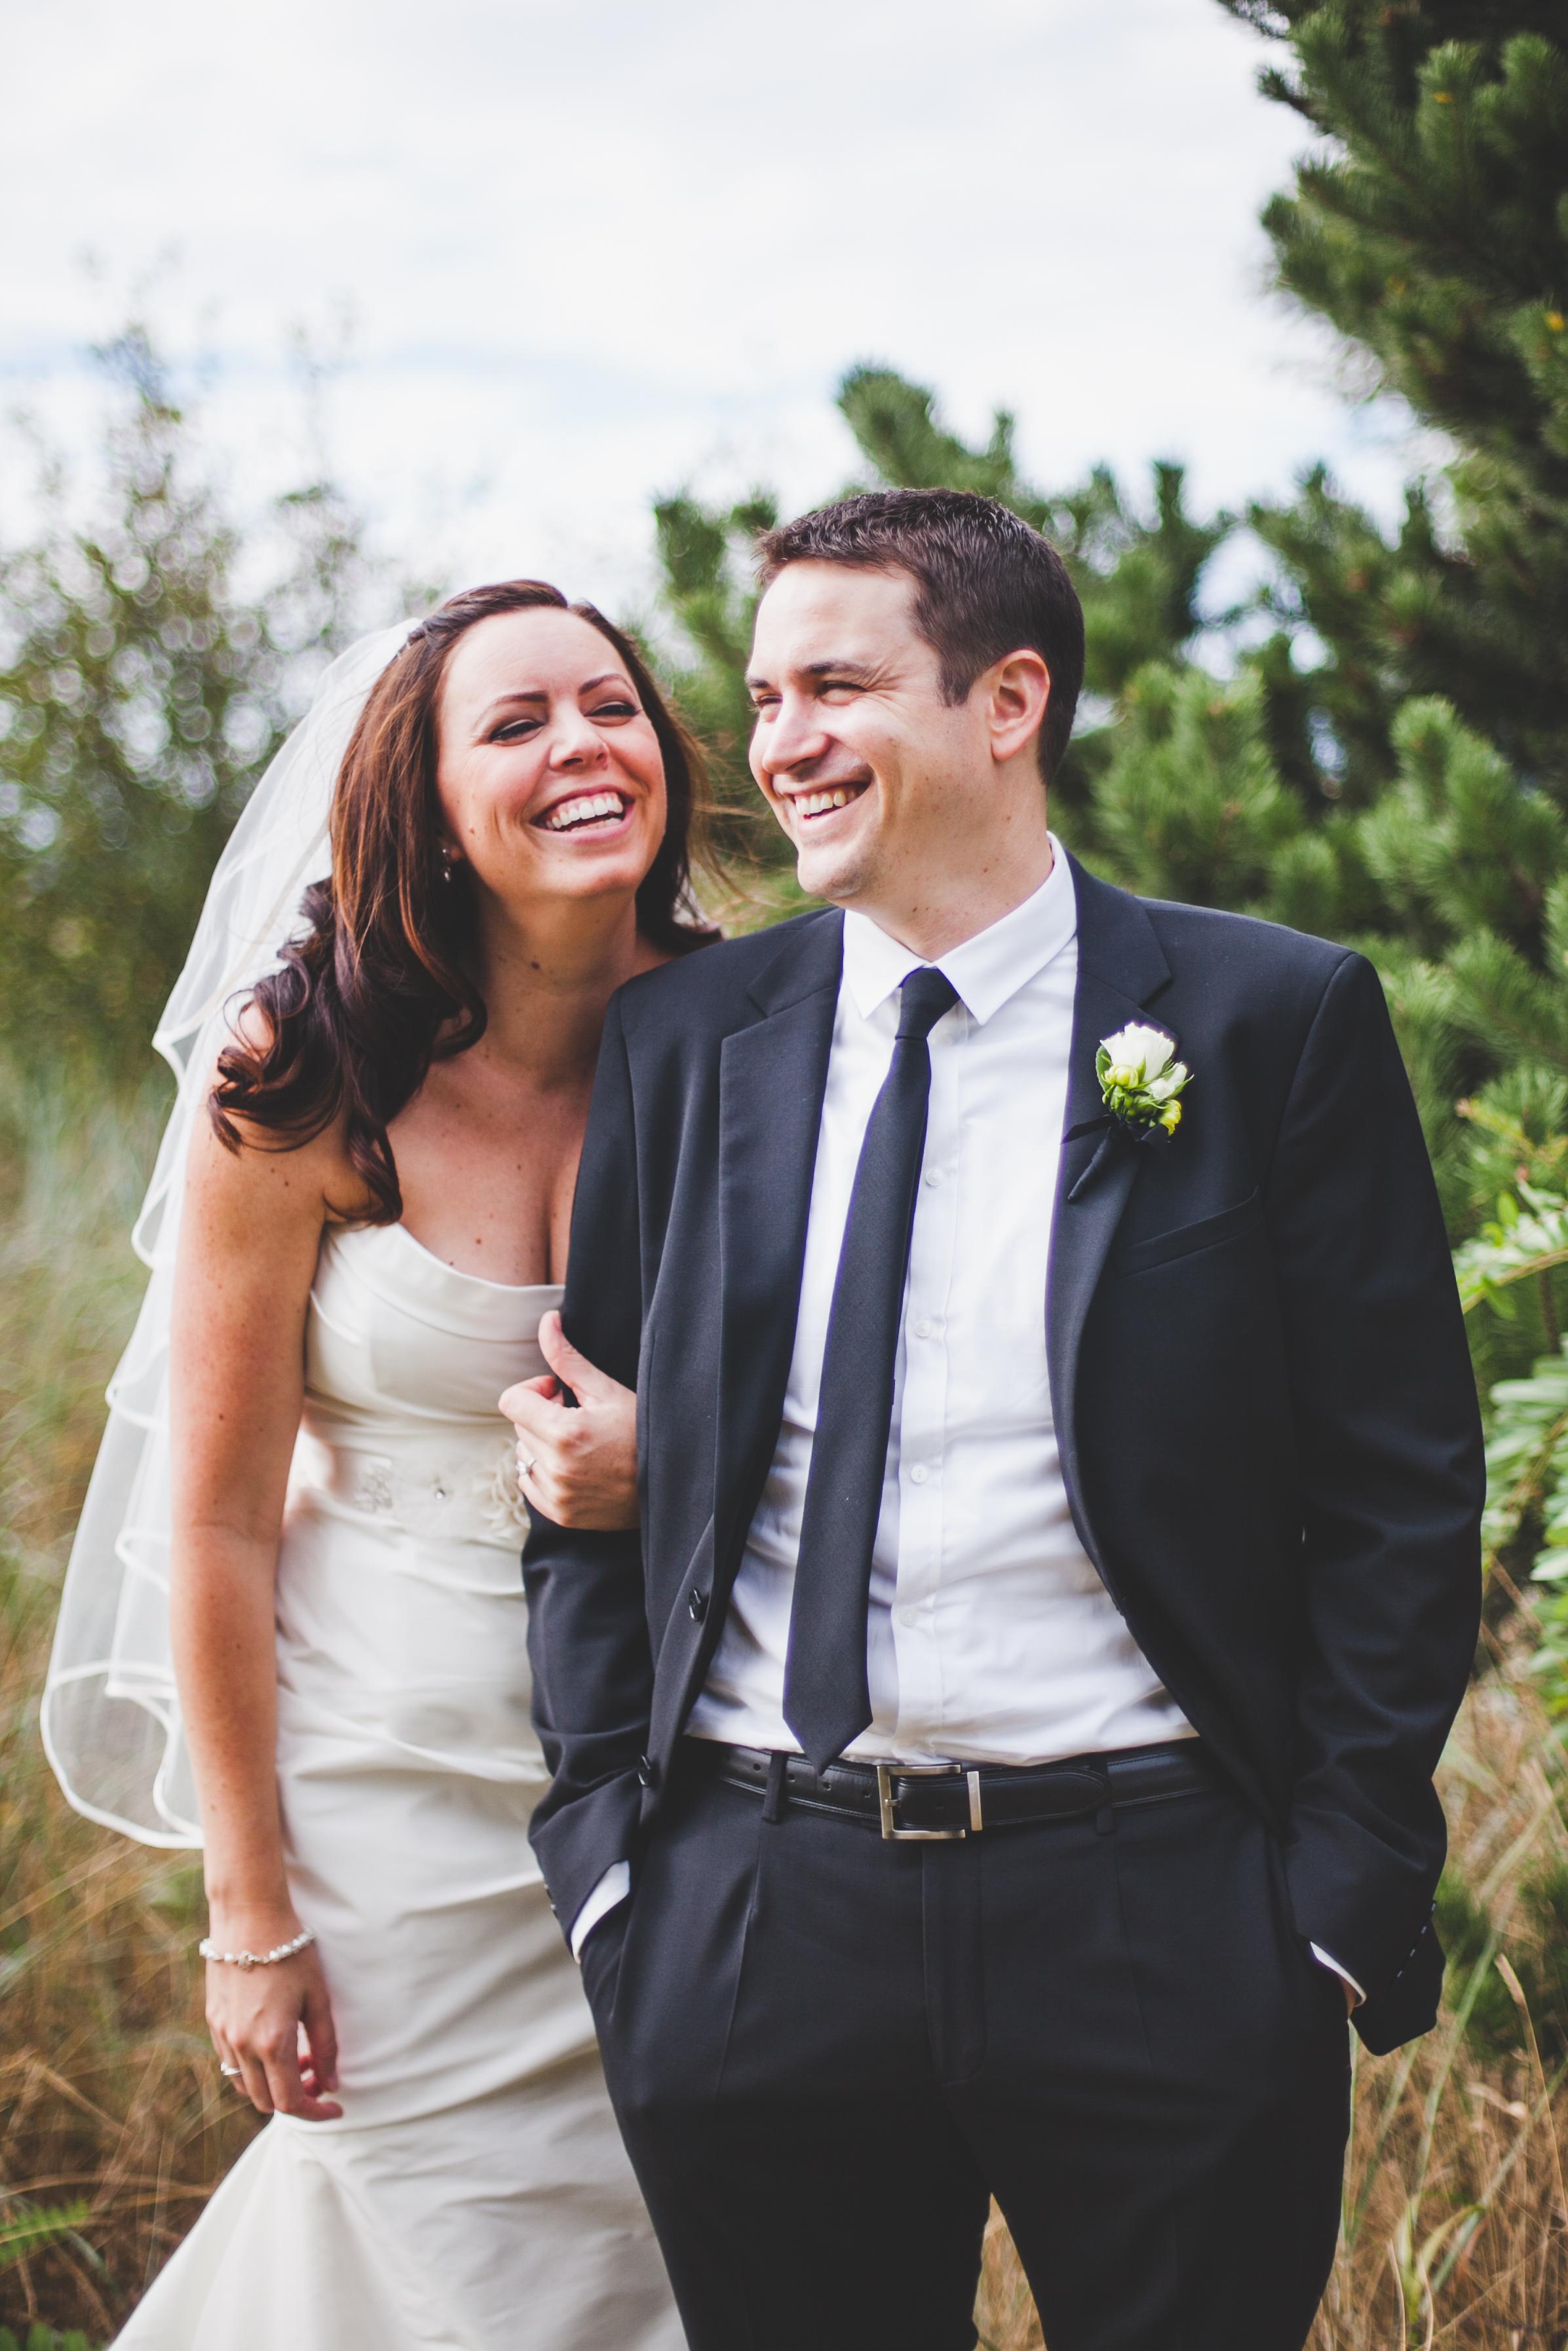 Wedding images for Jodie and Ryan. August 23, 2013 at Golden Gardens Bathhouse (Ballard) Seattle, WA.